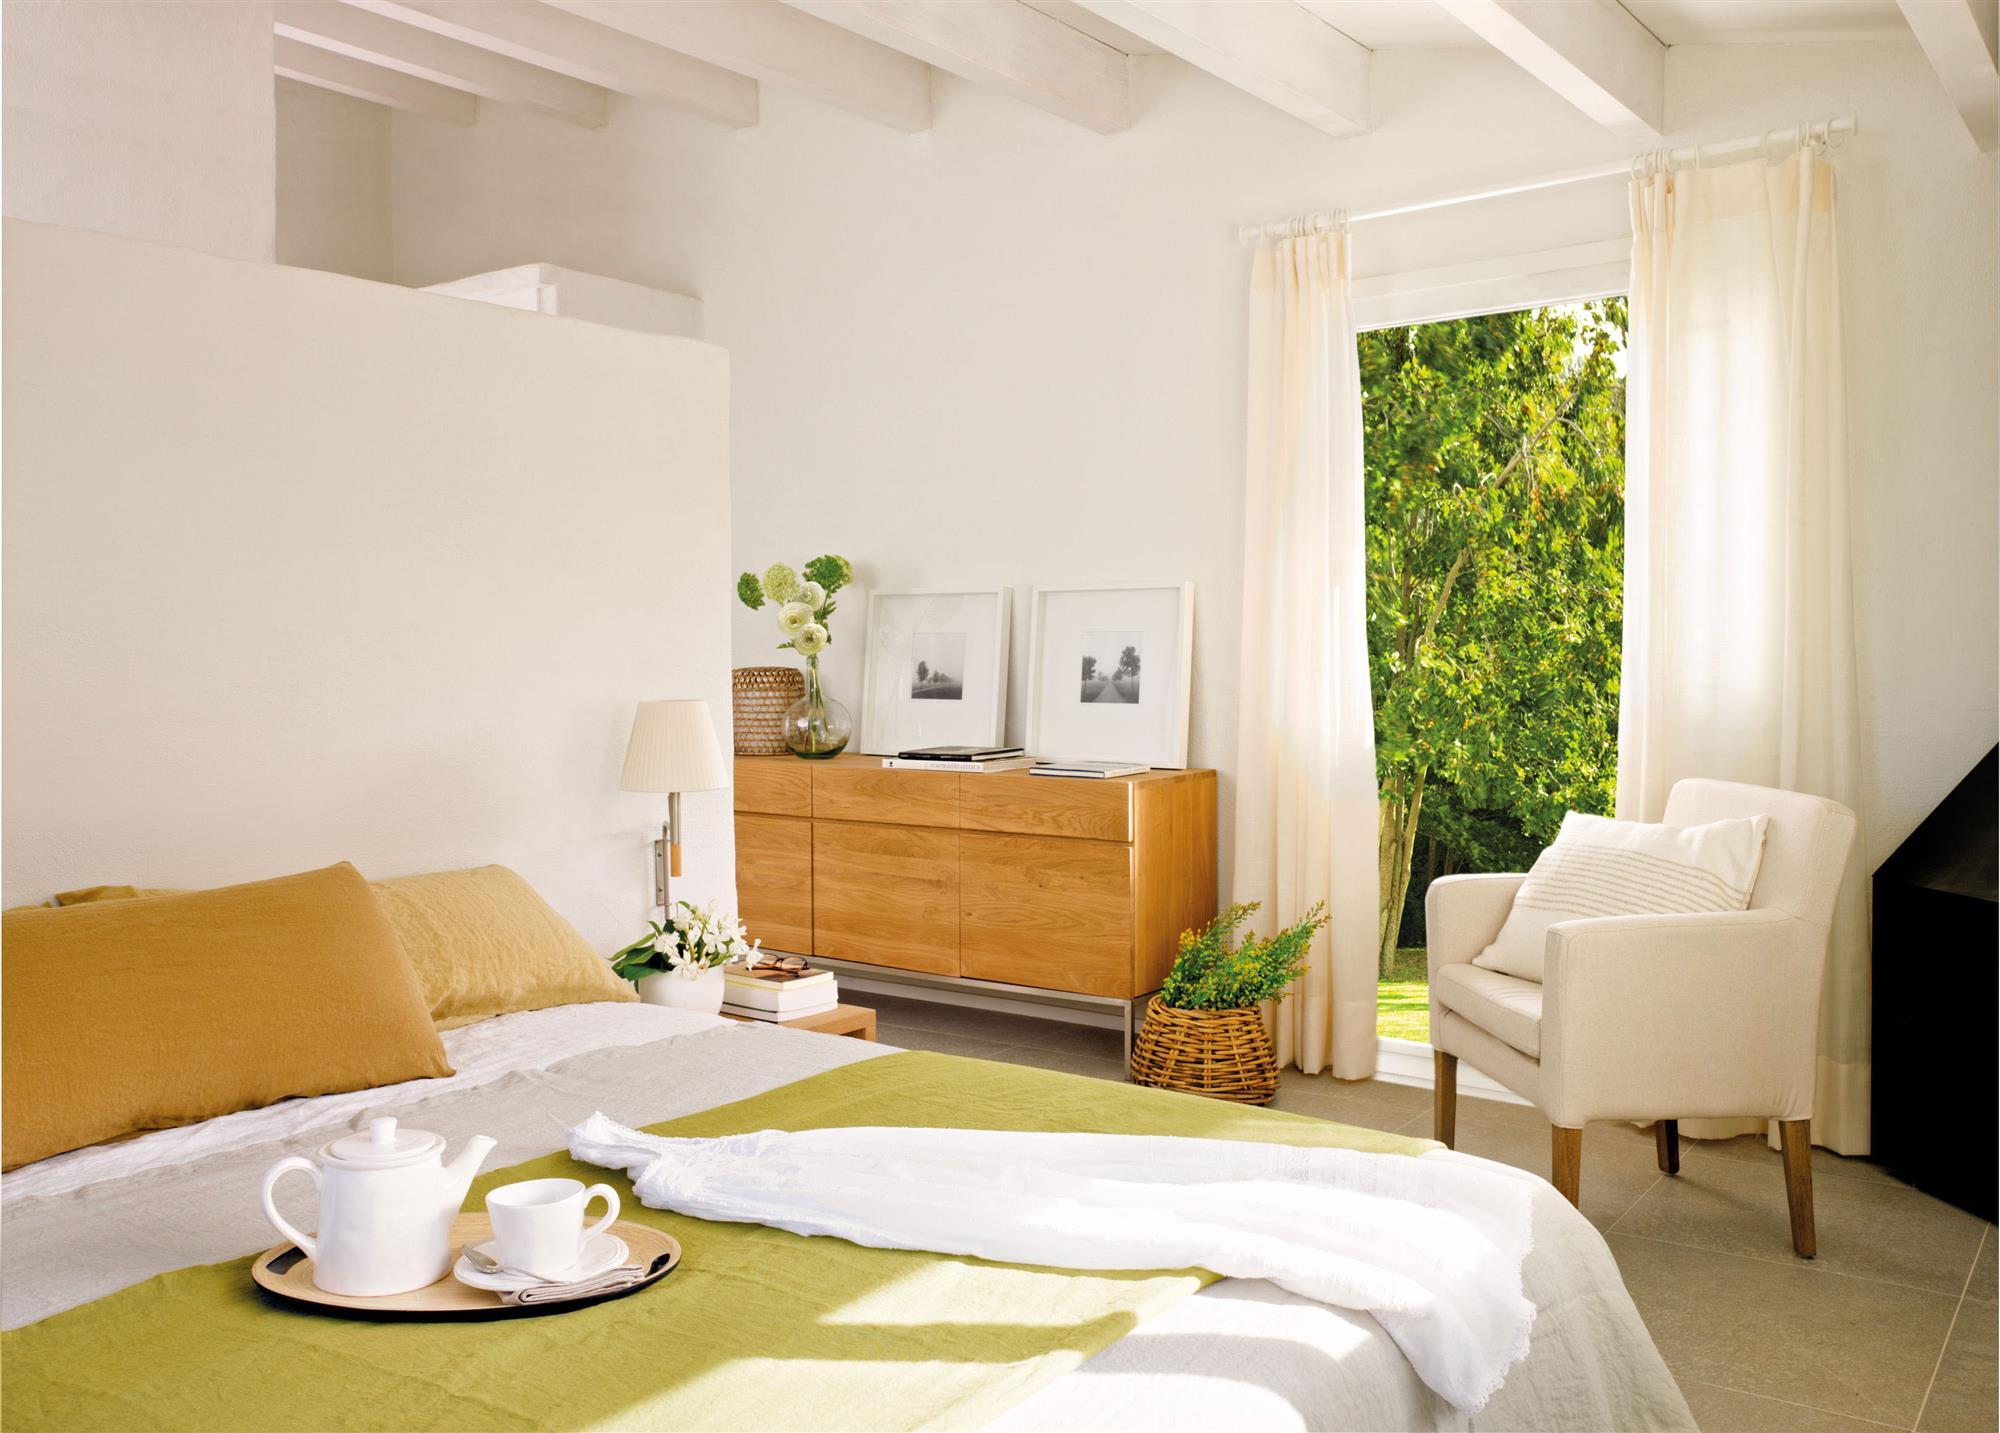 395 fotos de c modas - Butaca dormitorio ...